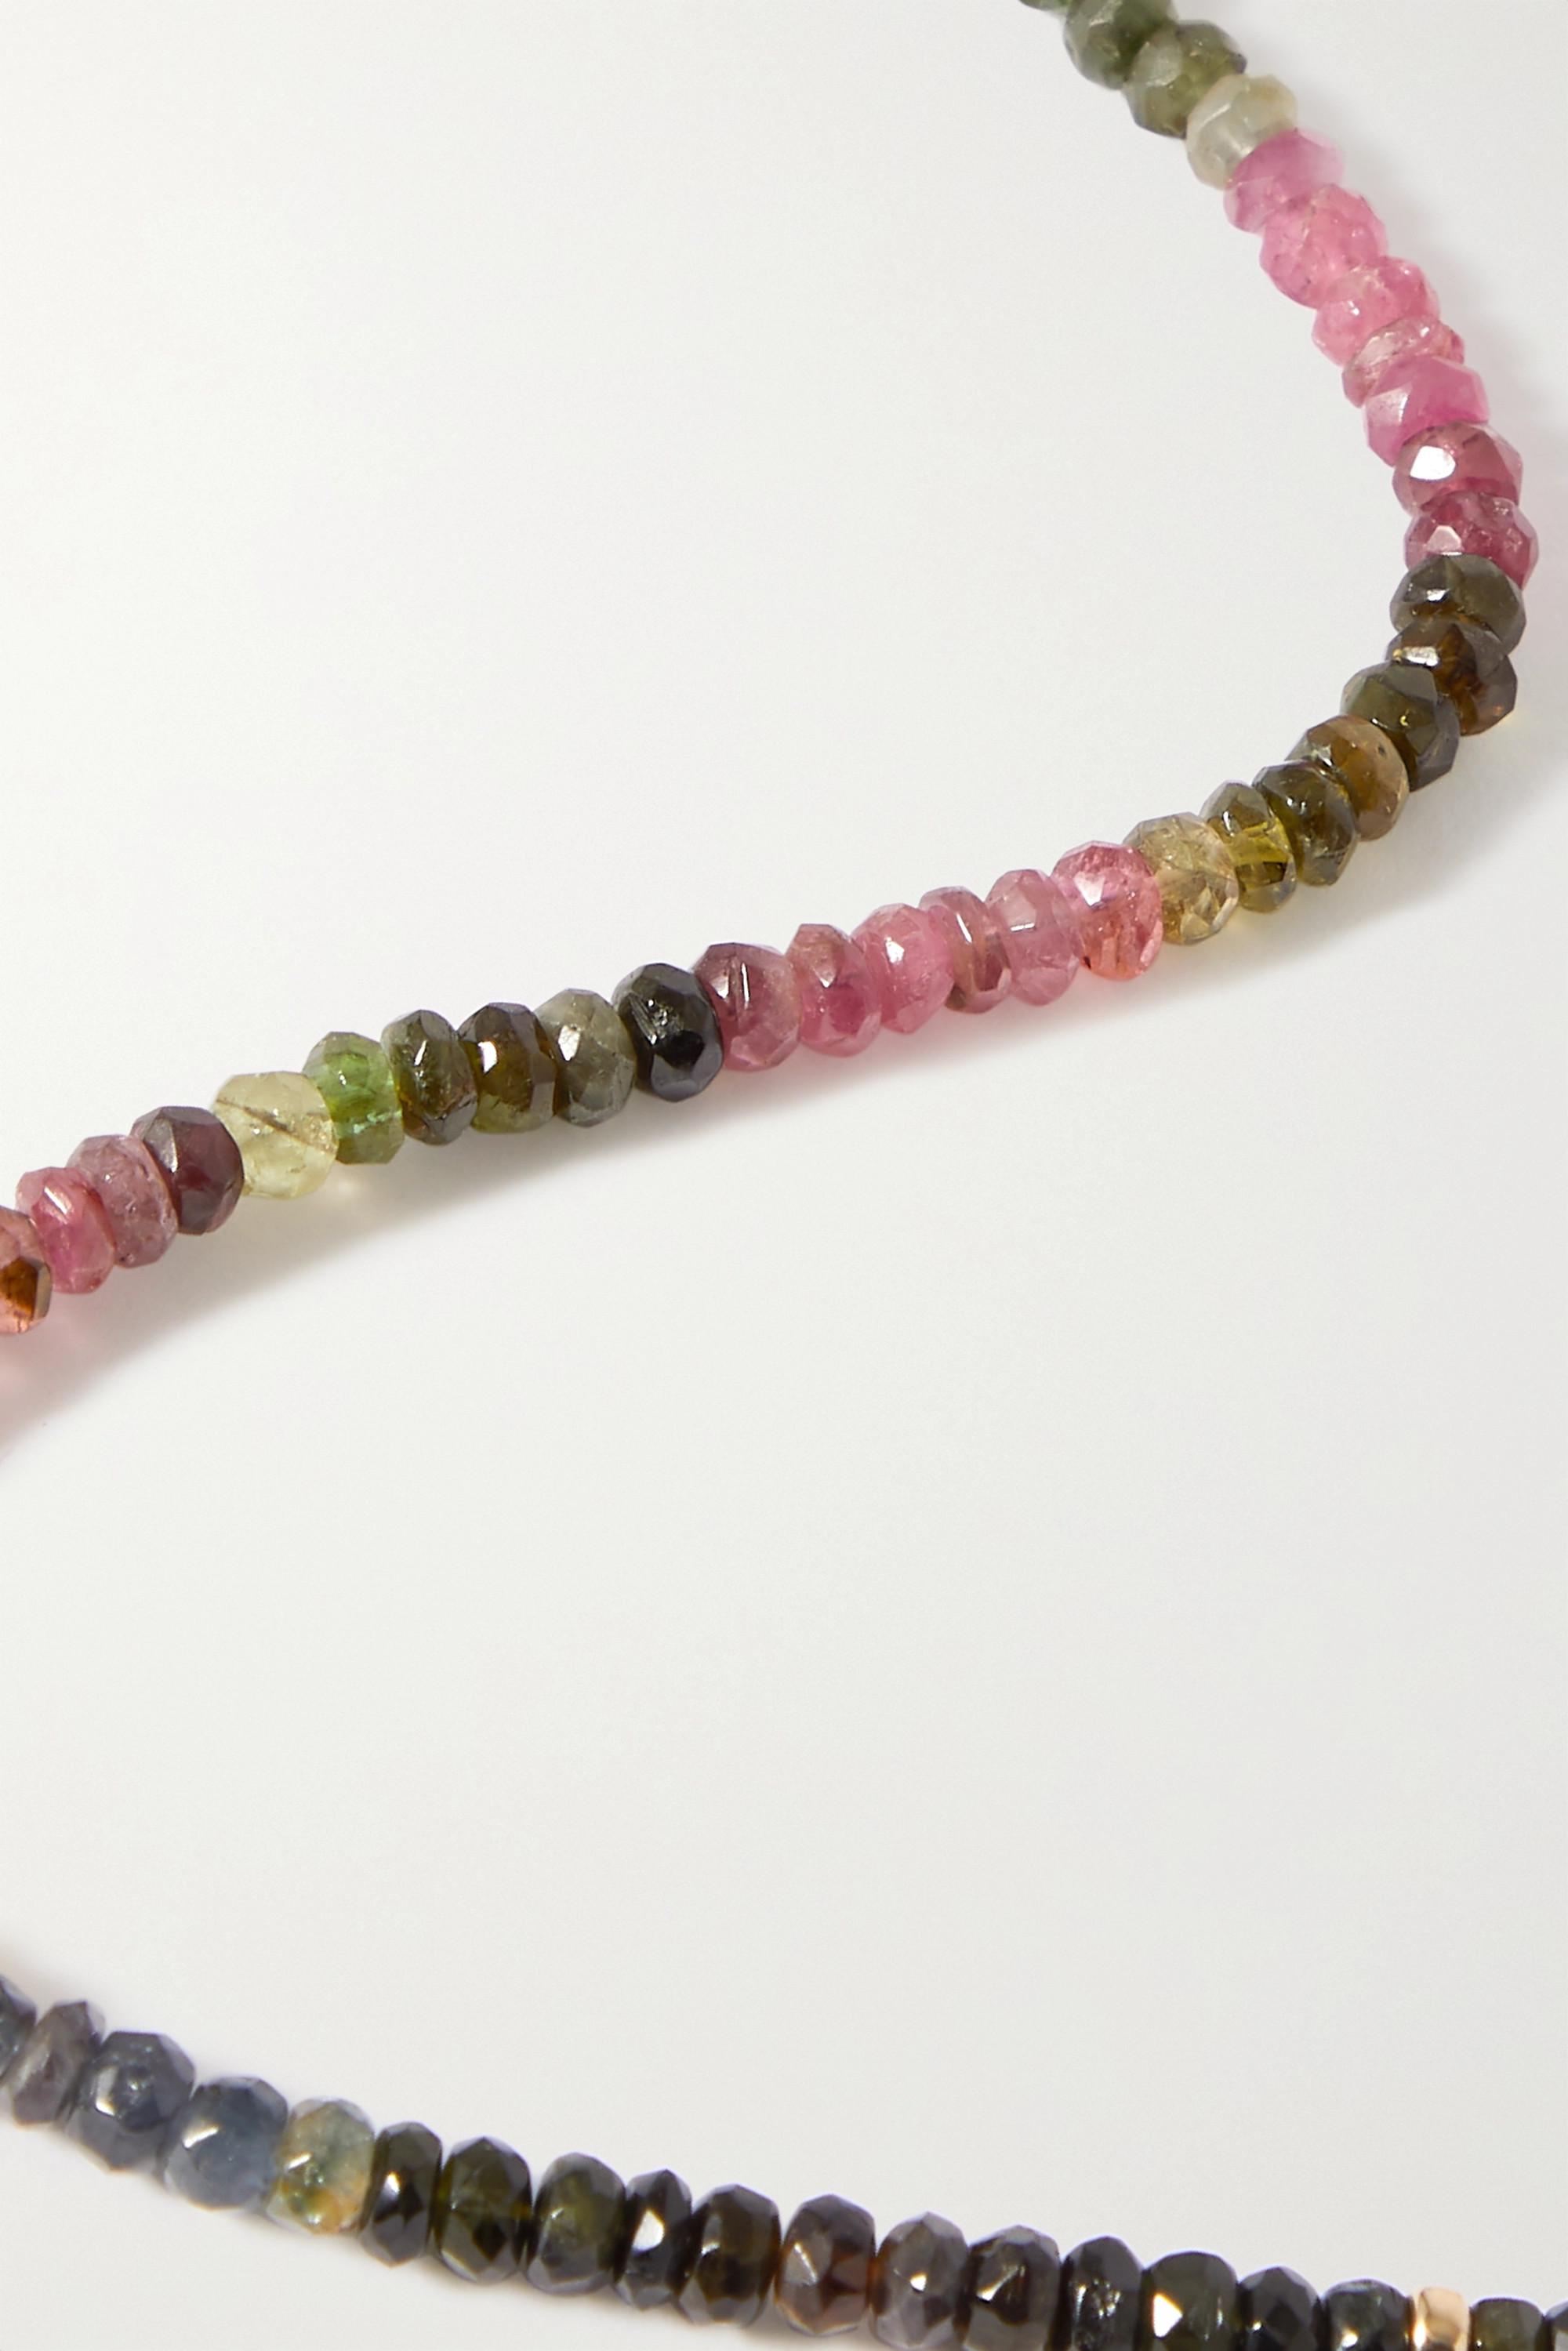 JIA JIA Arizona gold, tourmaline and amethyst necklace